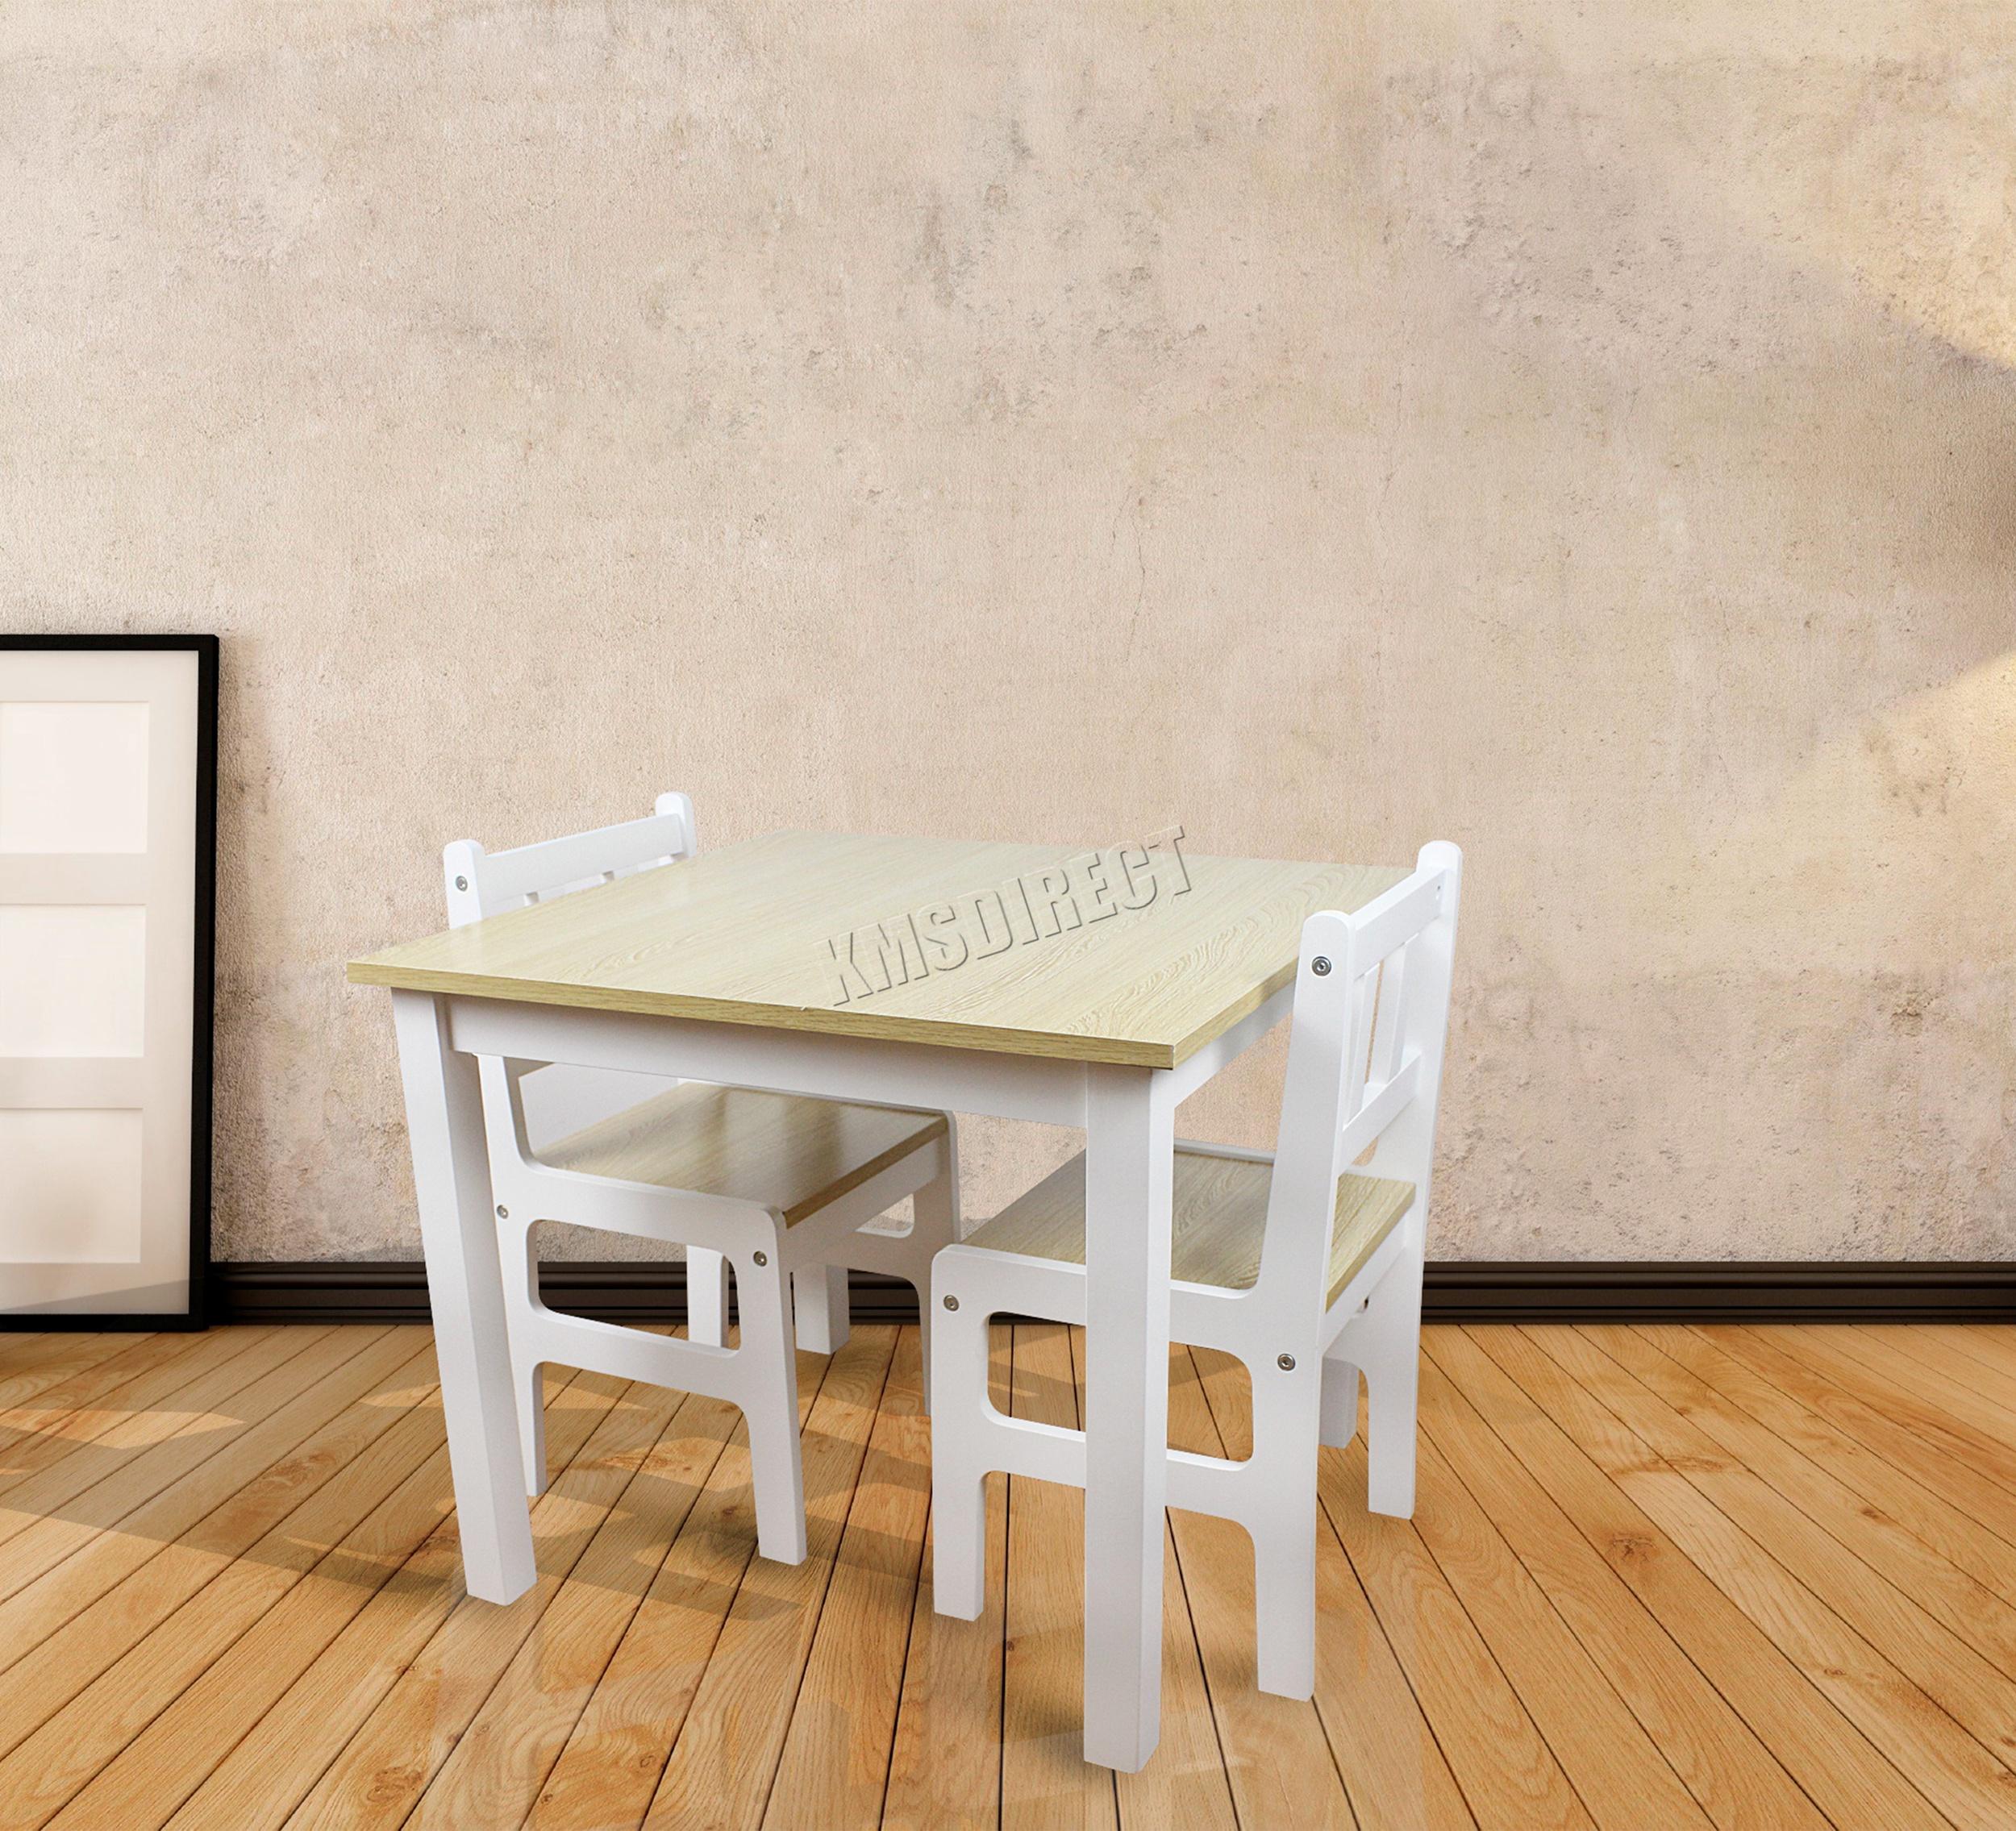 foxhunter kinder tisch mit 2 st hle set toy untersuchung spielzimmer holz kts01 ebay. Black Bedroom Furniture Sets. Home Design Ideas